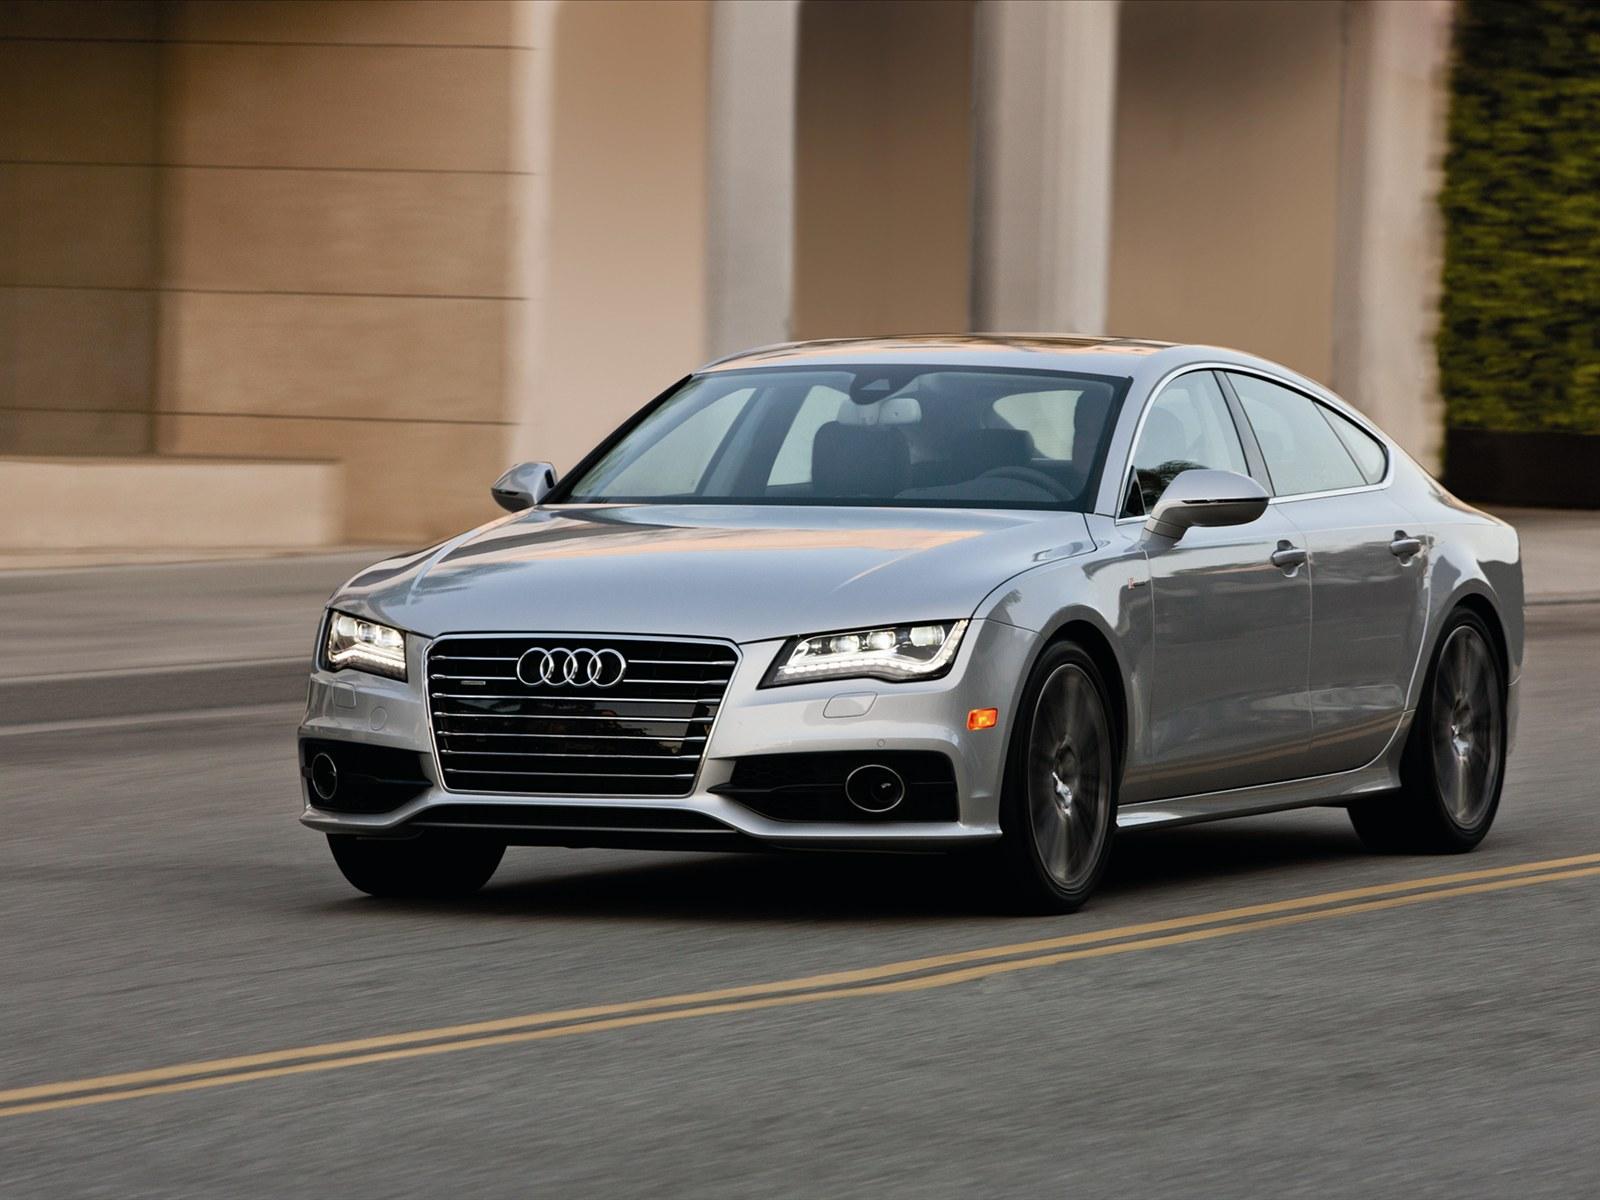 Car Pictures Audi A7 2012